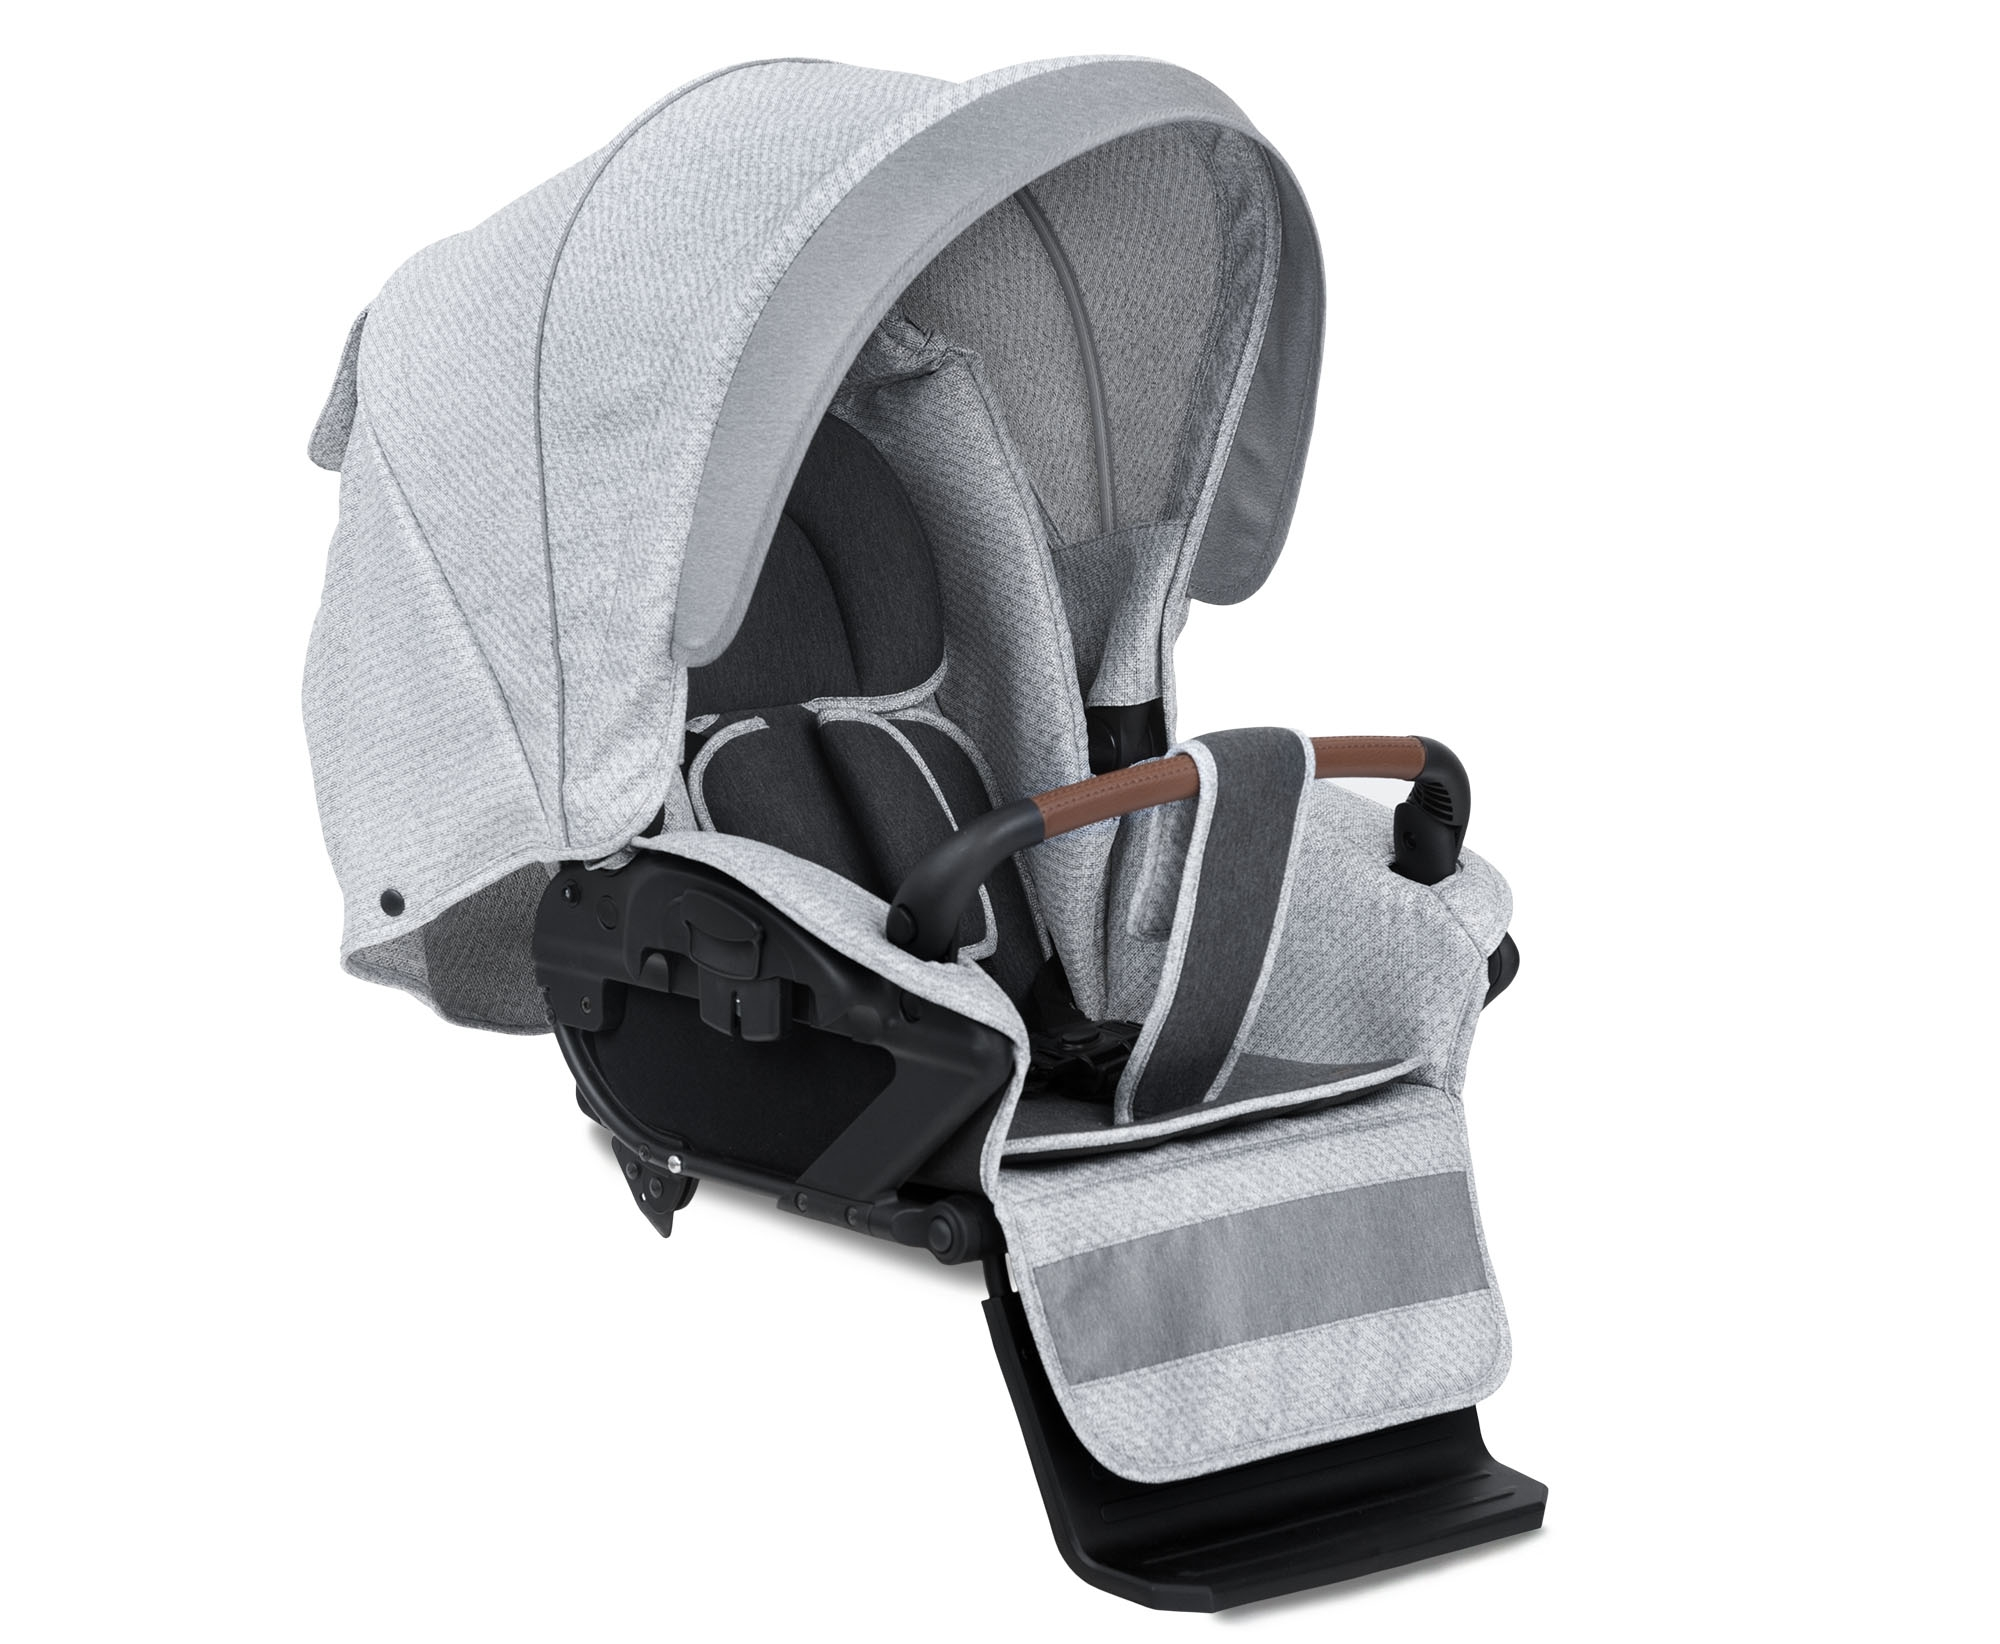 luxus retro kombi kinderwagen navington caravel stoff mit babywanne 8 farben. Black Bedroom Furniture Sets. Home Design Ideas